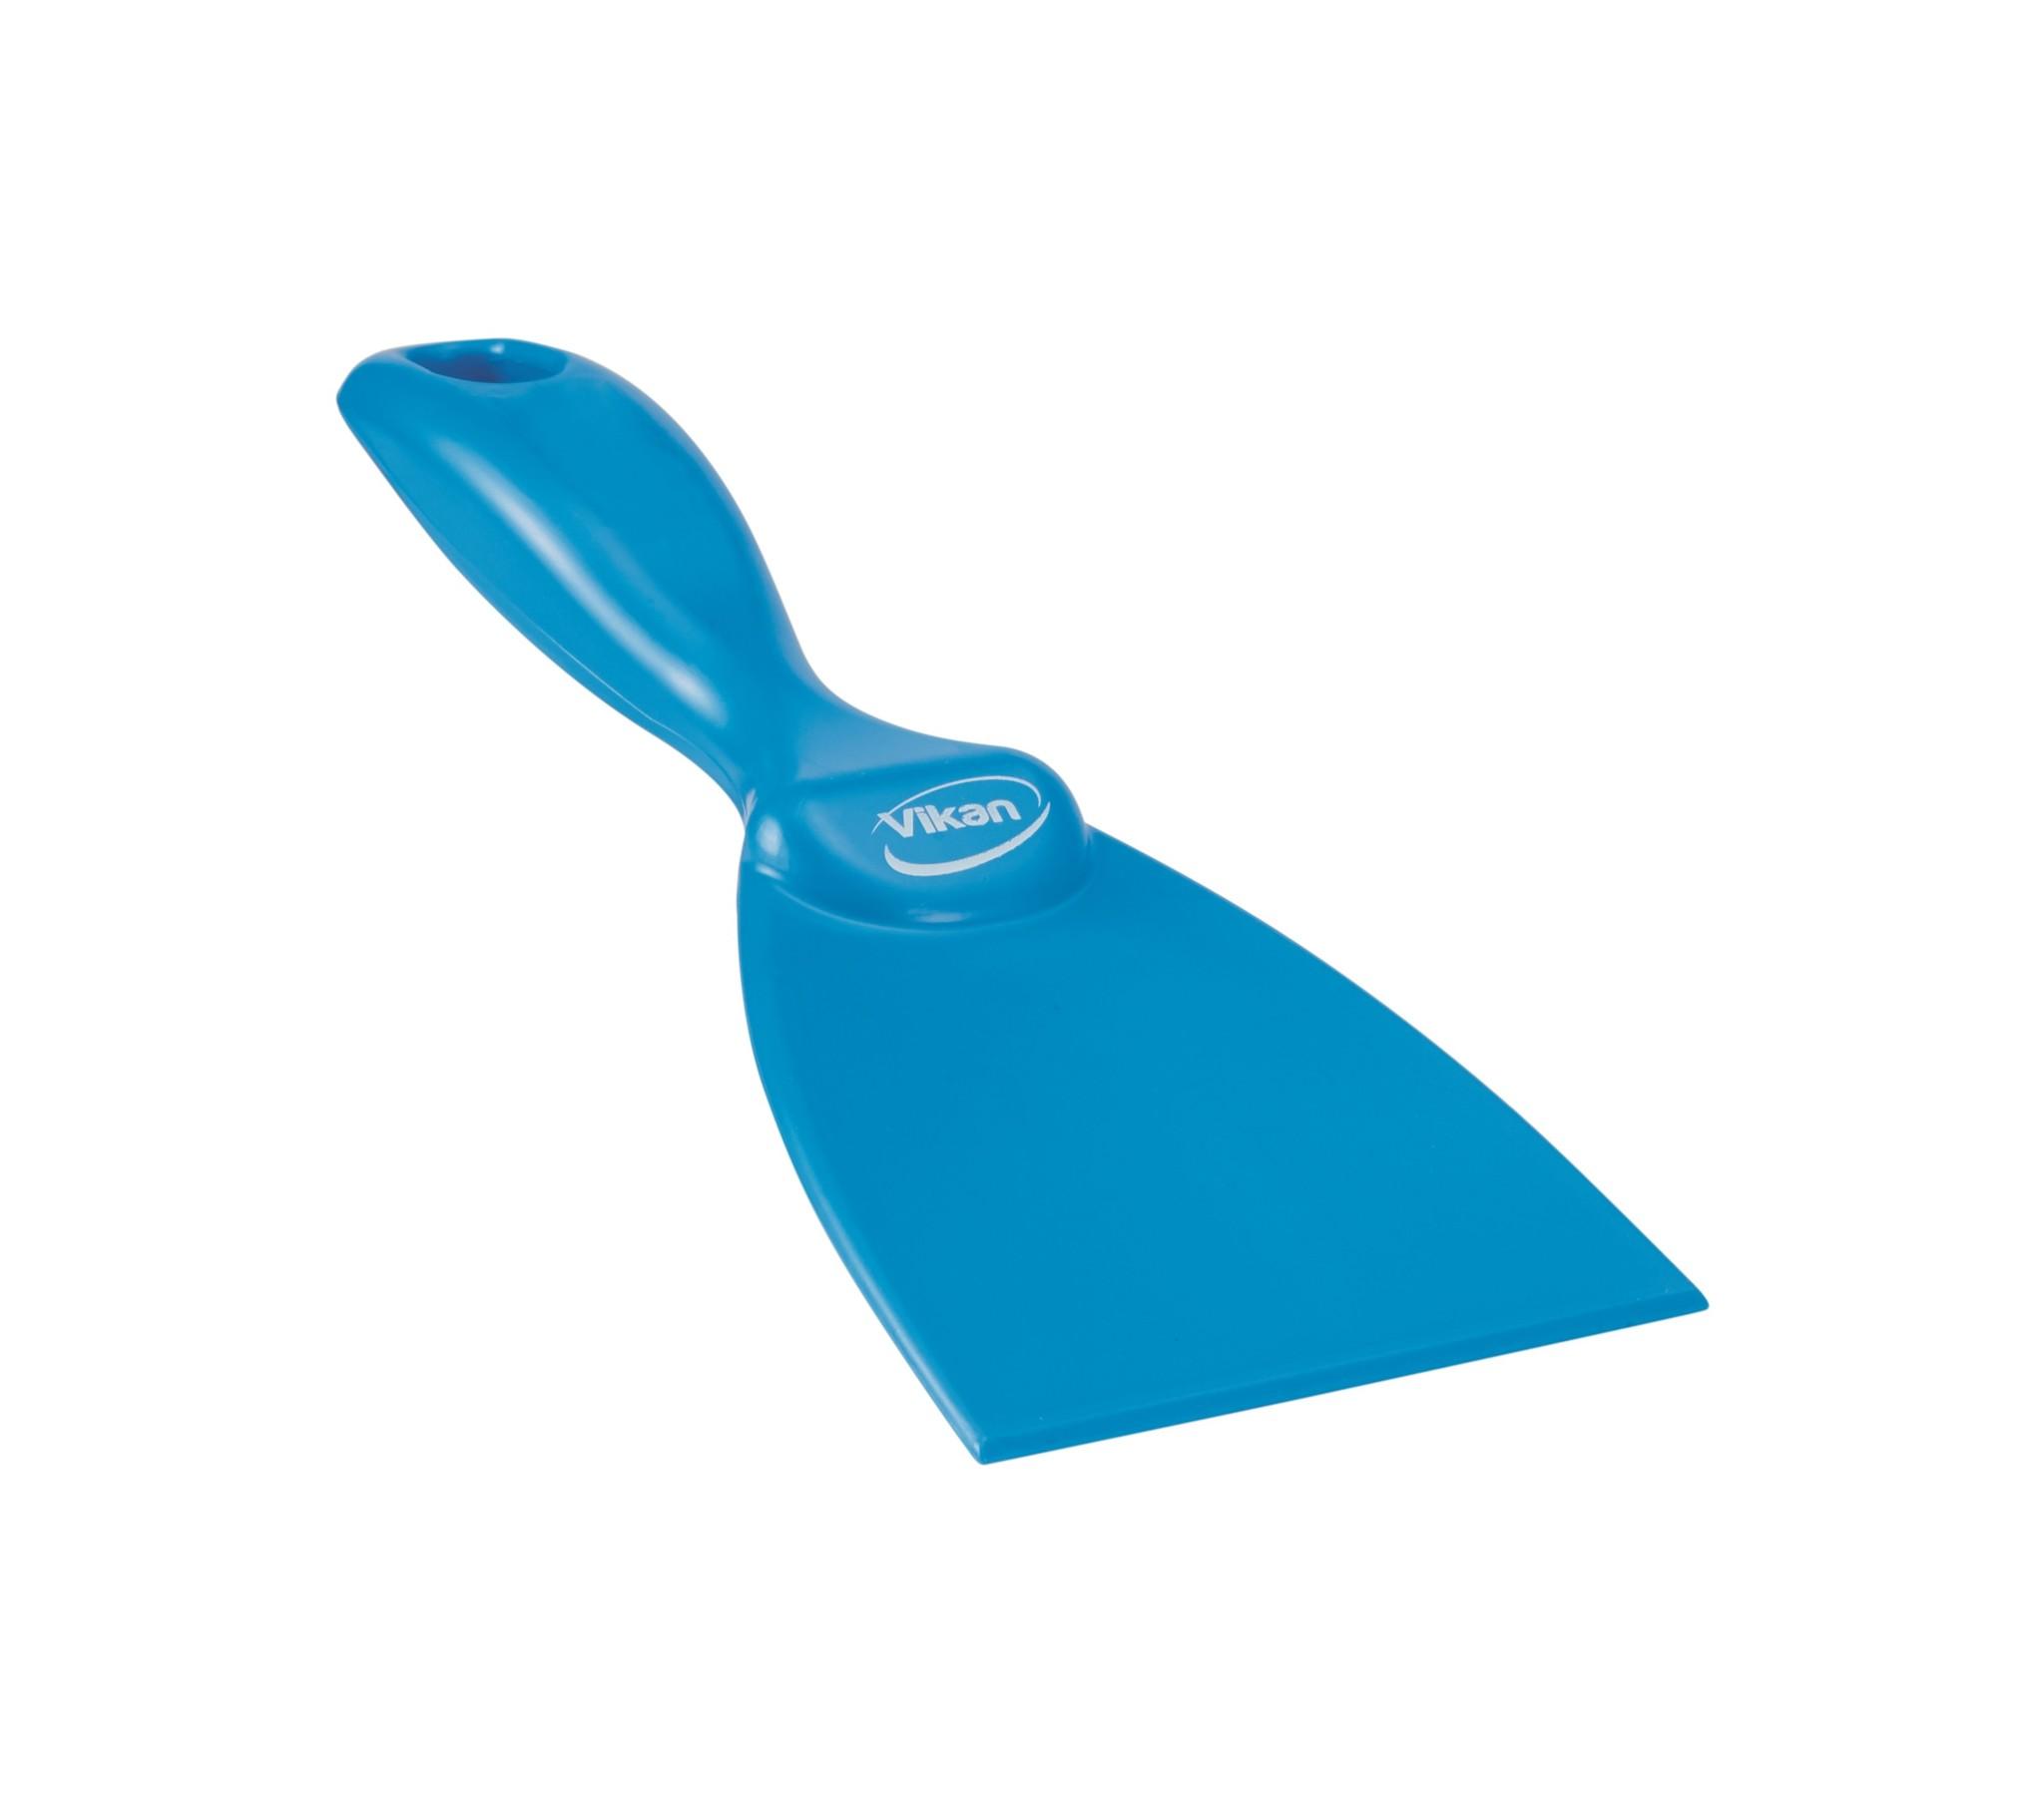 Vikan Handschraper 75 x 210 mm, blauw